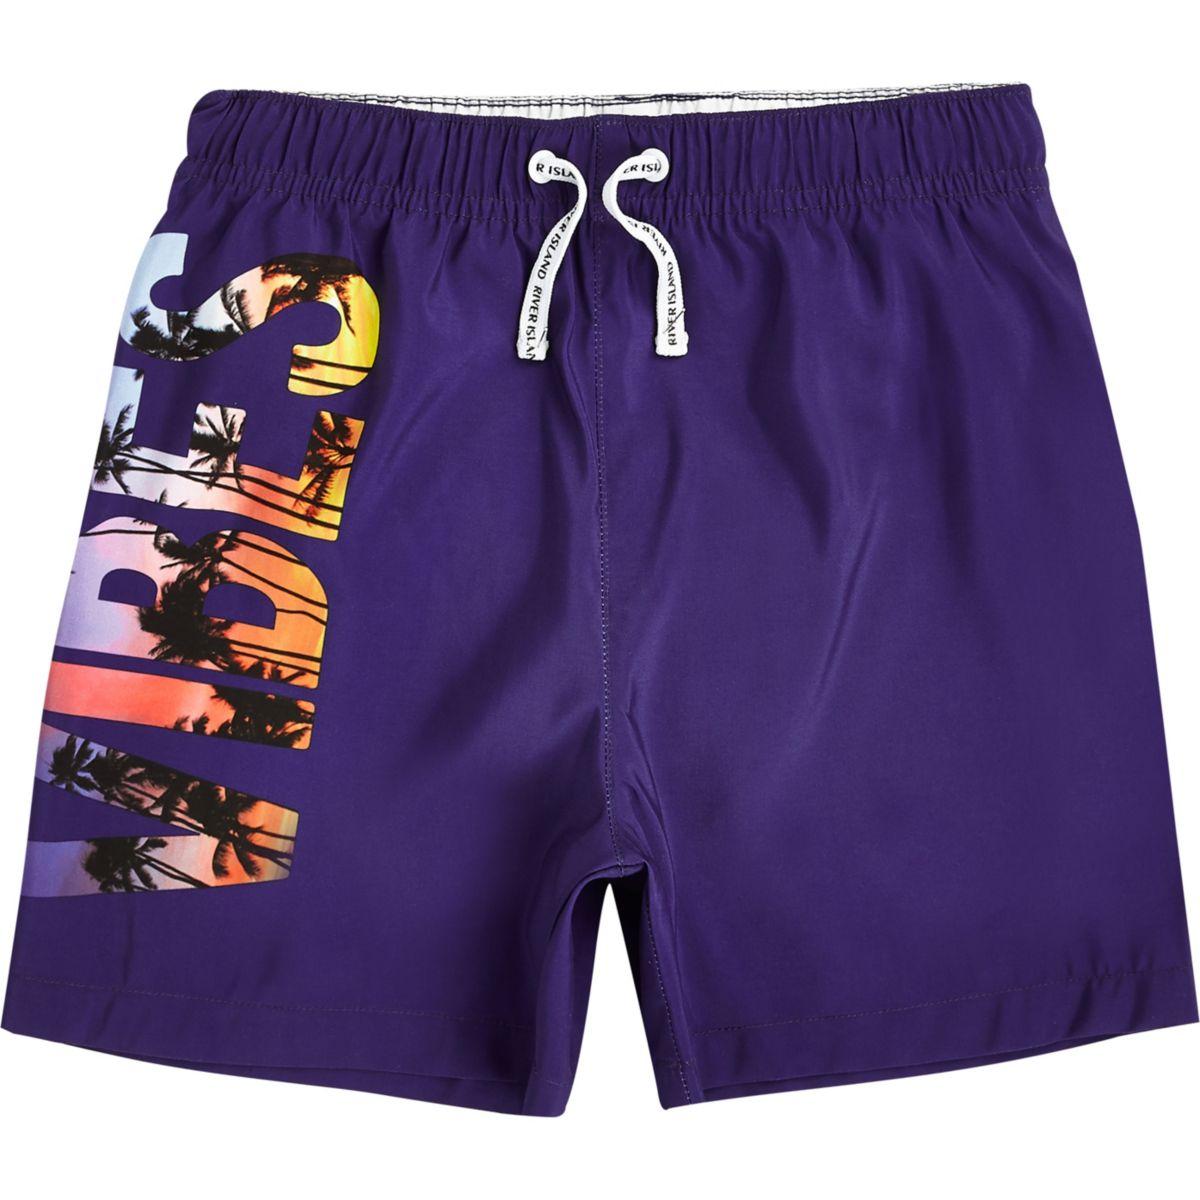 Boys purple 'vibes' print swim shorts